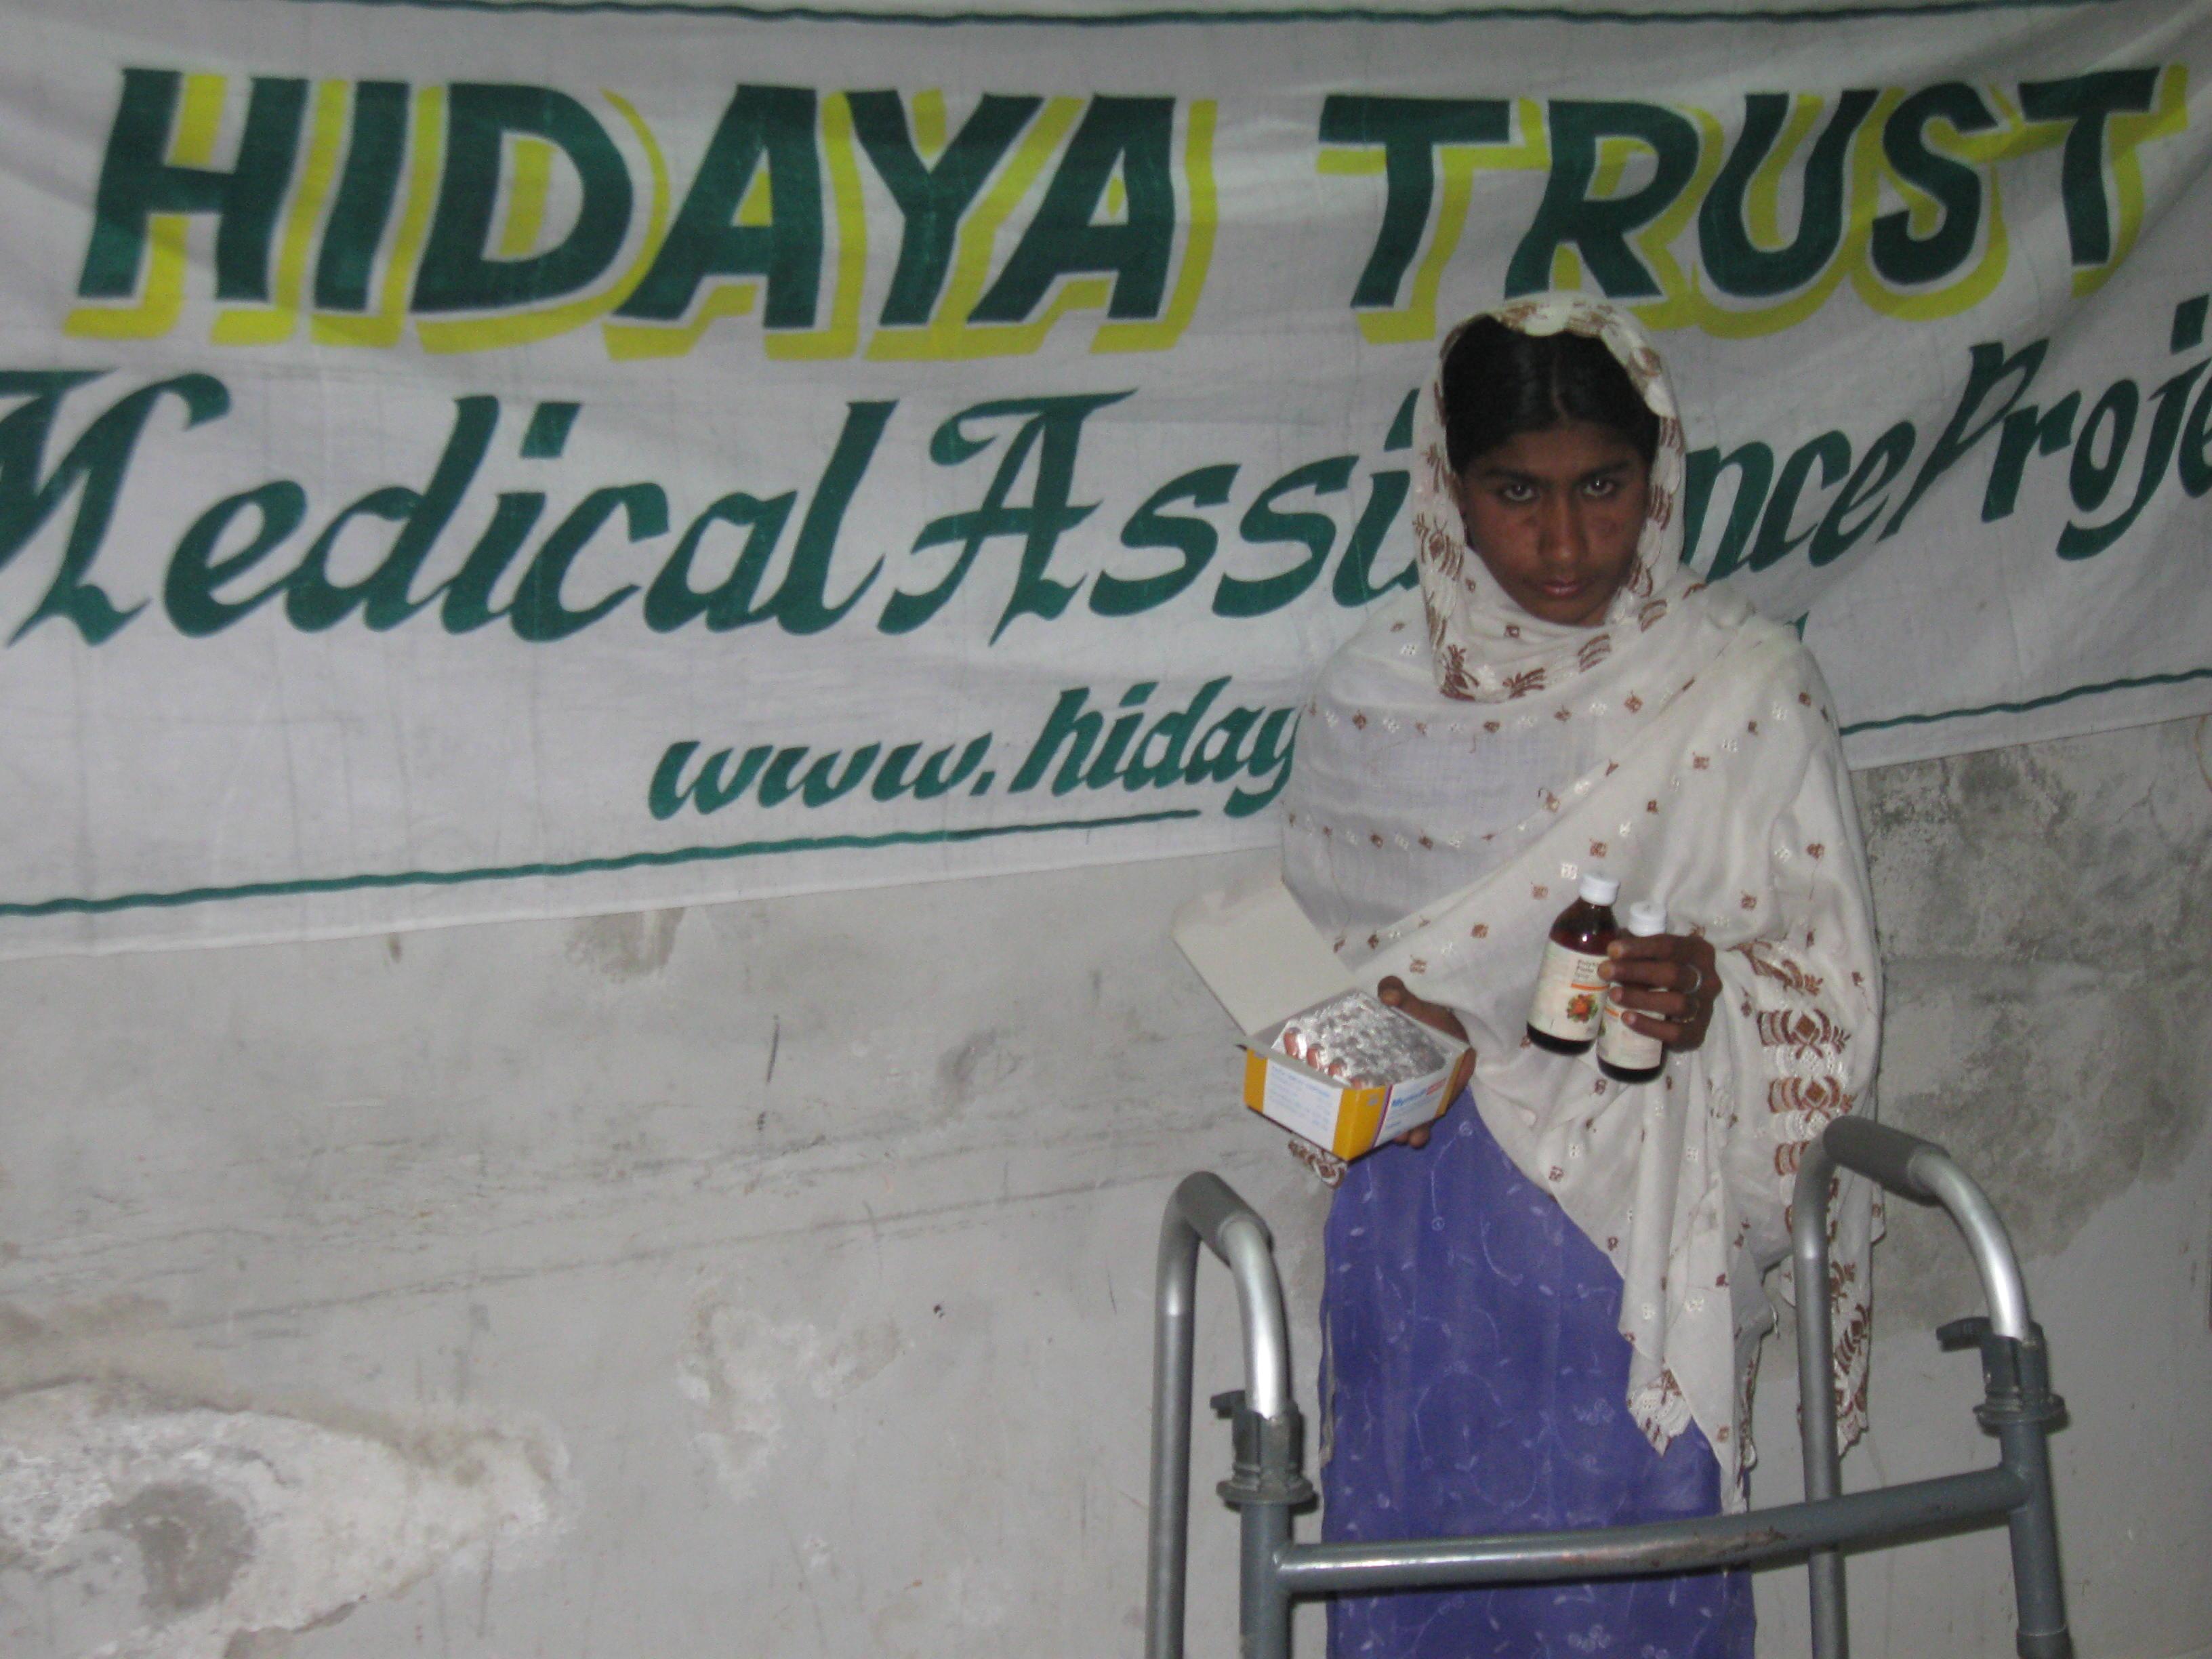 20100517_Sldo_Meda_Aqureshi_Aqureshi_Sind_Shp_Shp_Medicine_Given_To_Patient_2